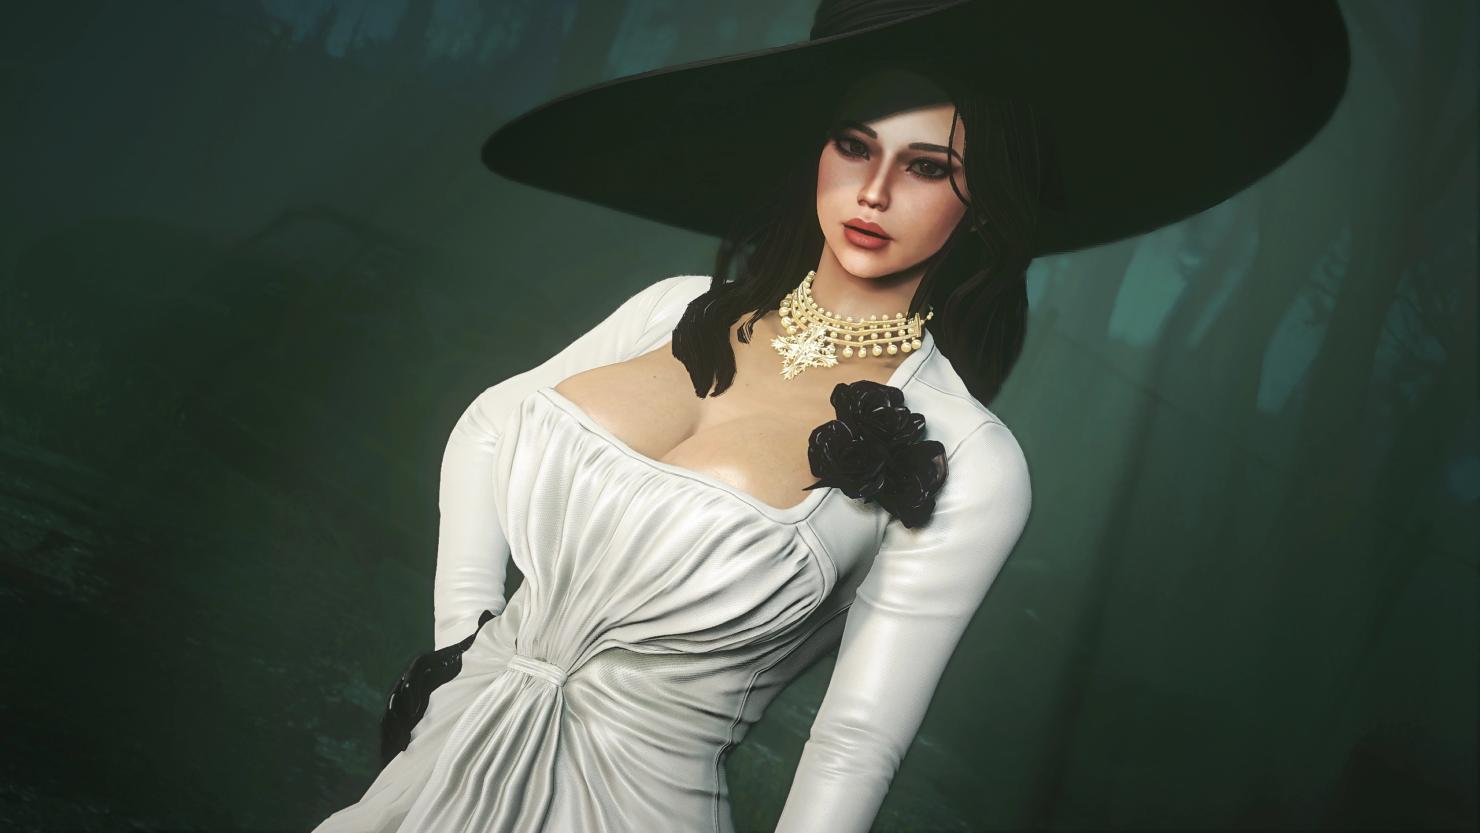 lady-dimitrescu-fallout-4-mod-1